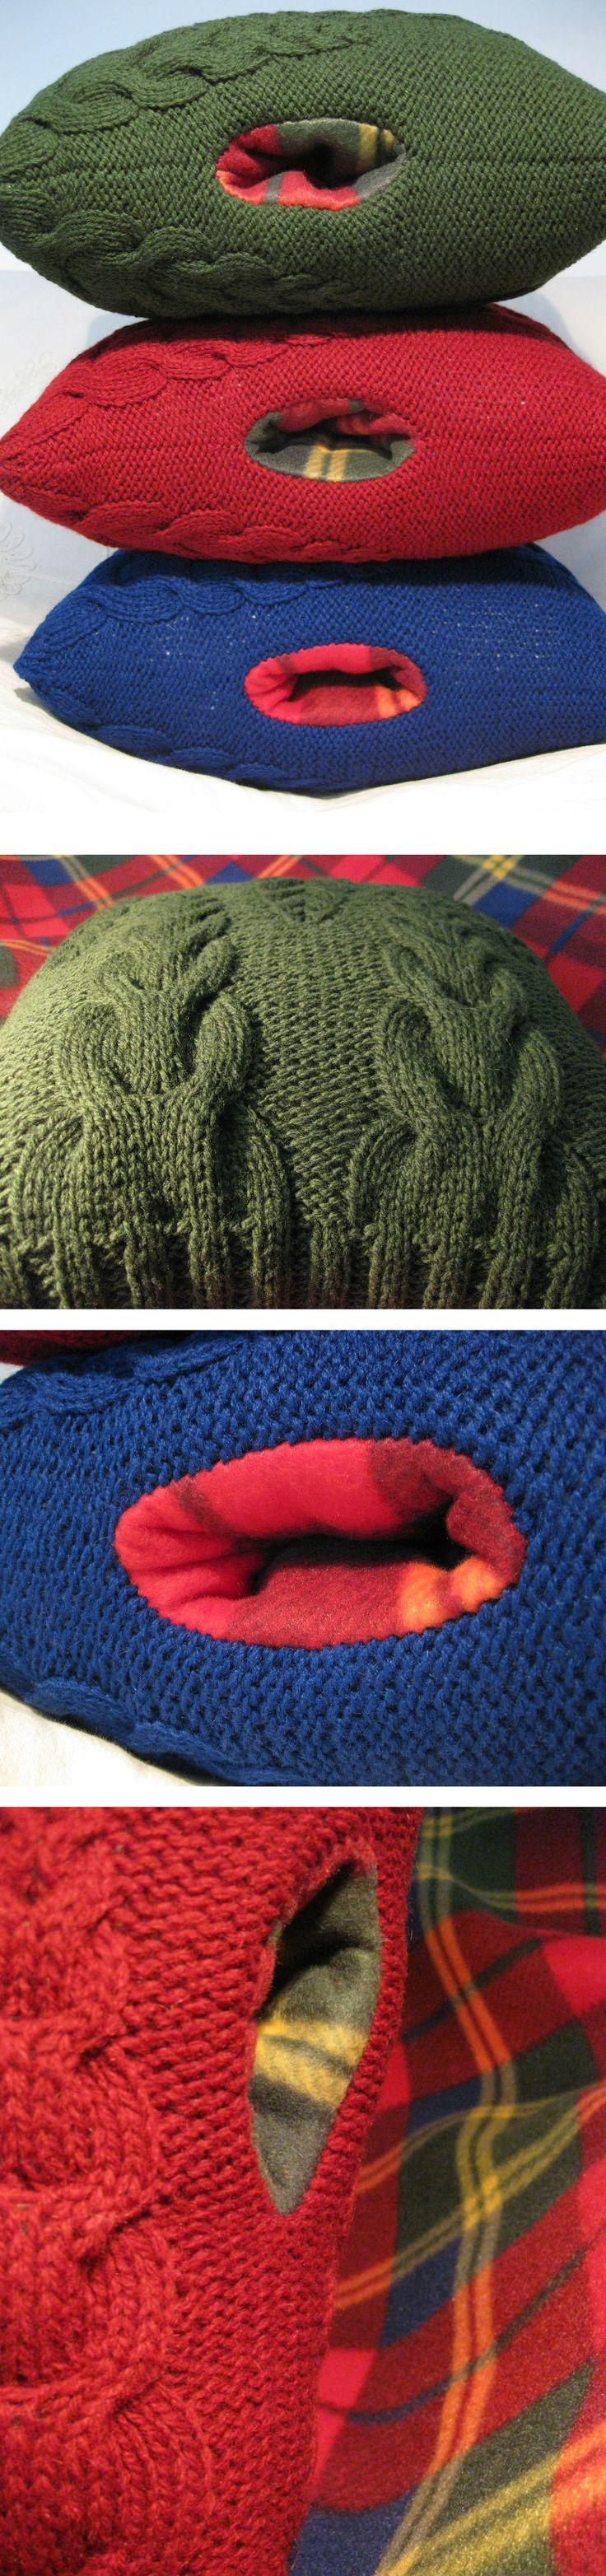 #Scaldamani. #tartan collection. 100% lana shetland, imbottitura in poliammide, interno in pile. #Handwarmer pillow. 100% shetland wool, polyammide filling, polar fleece lining. Da/from €45. #handmade #knit #interiordesign #homedecor